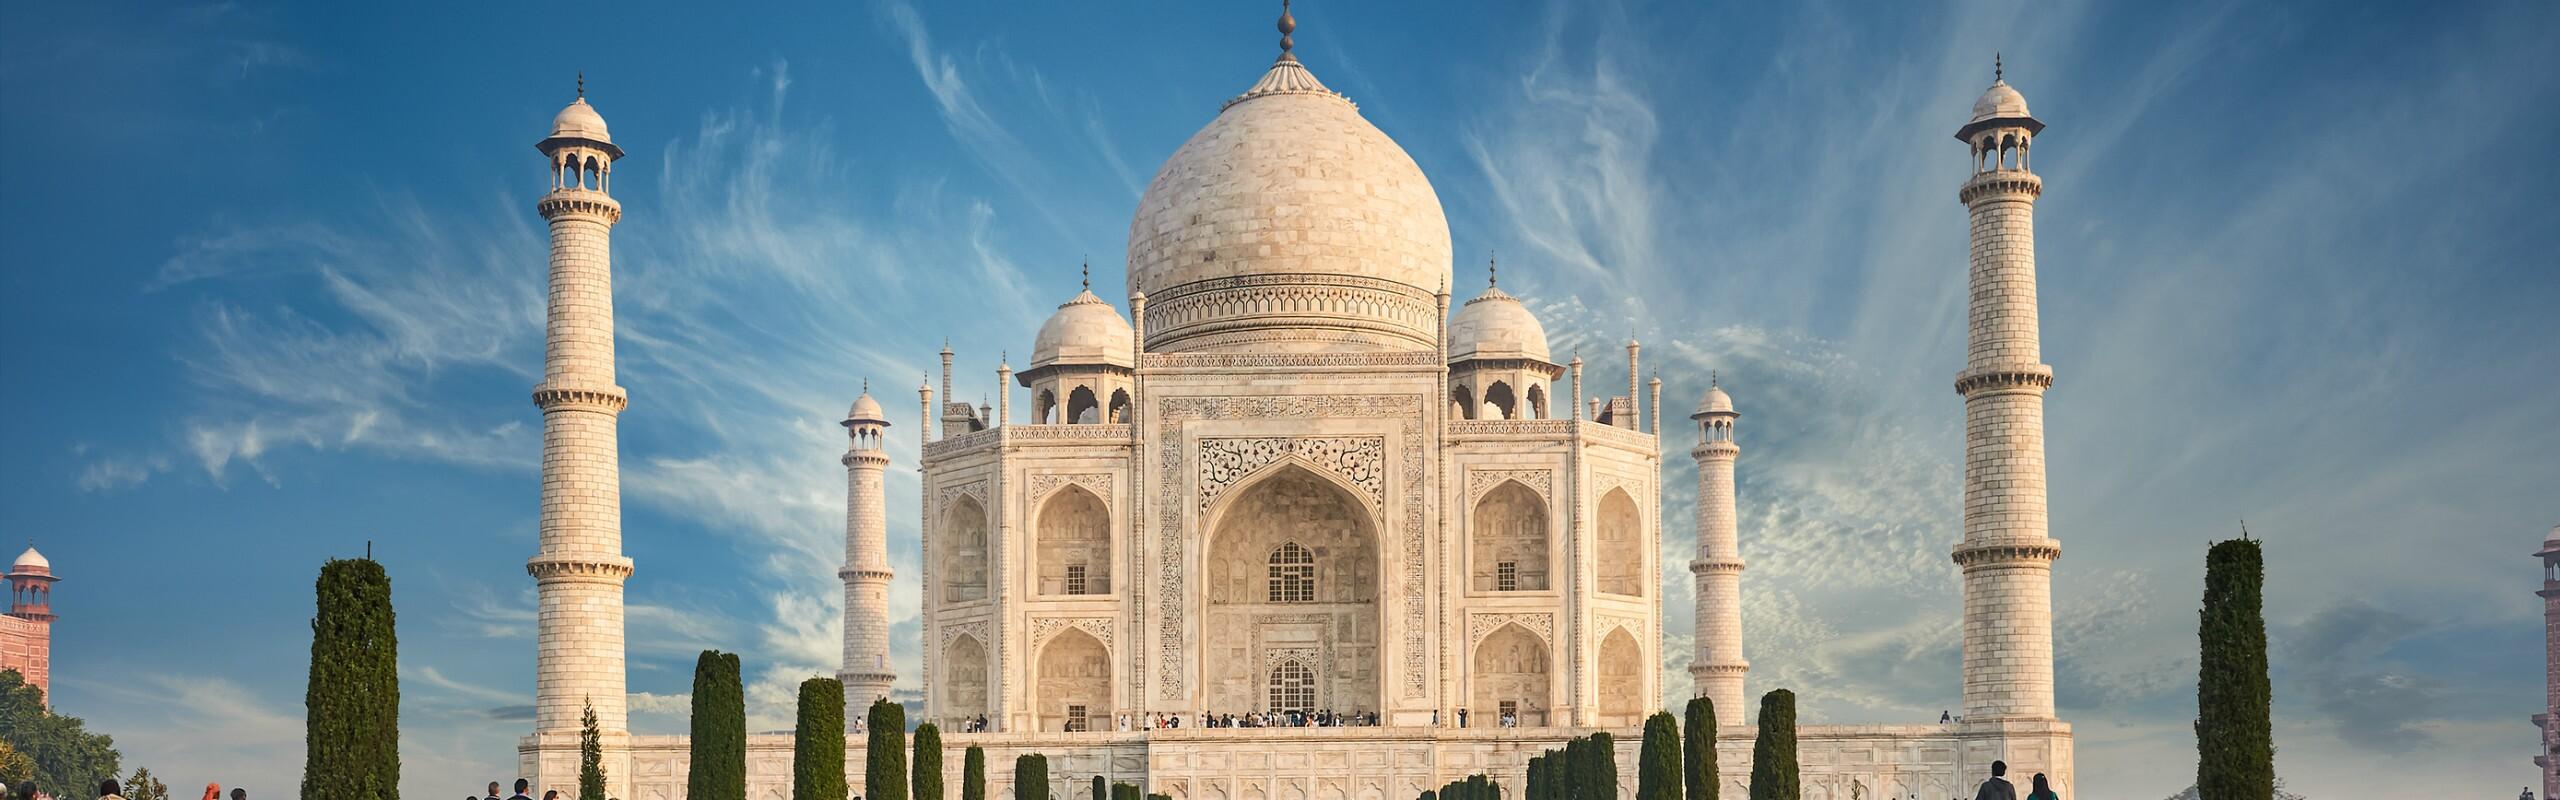 The Complete India, Sri Lanka, Nepal, and Bhutan Travel Guide